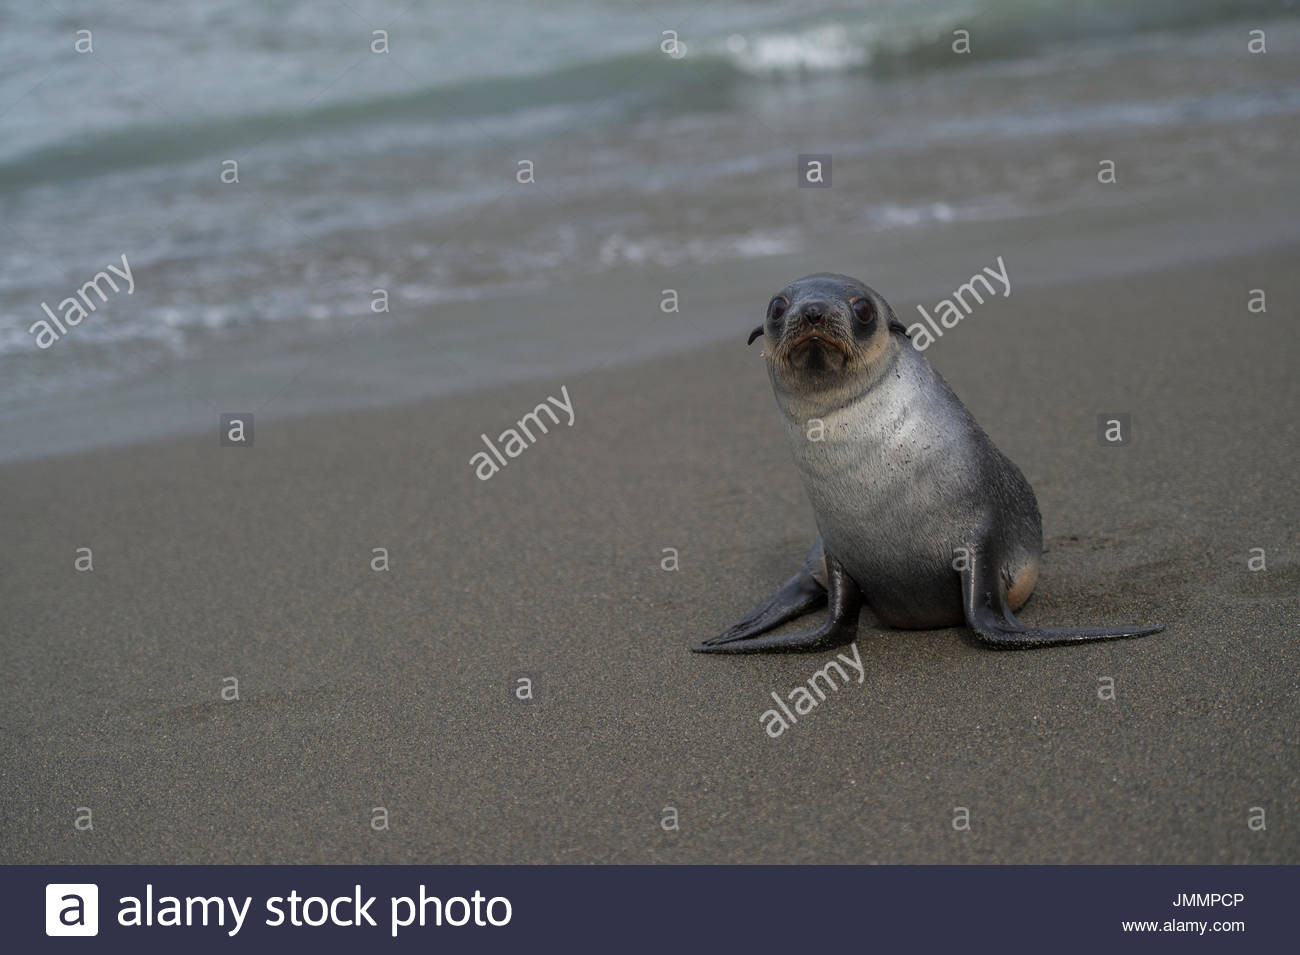 Antarctic fur seal, Arctocephalus gazella, on a beach on South Georgia. - Stock Image